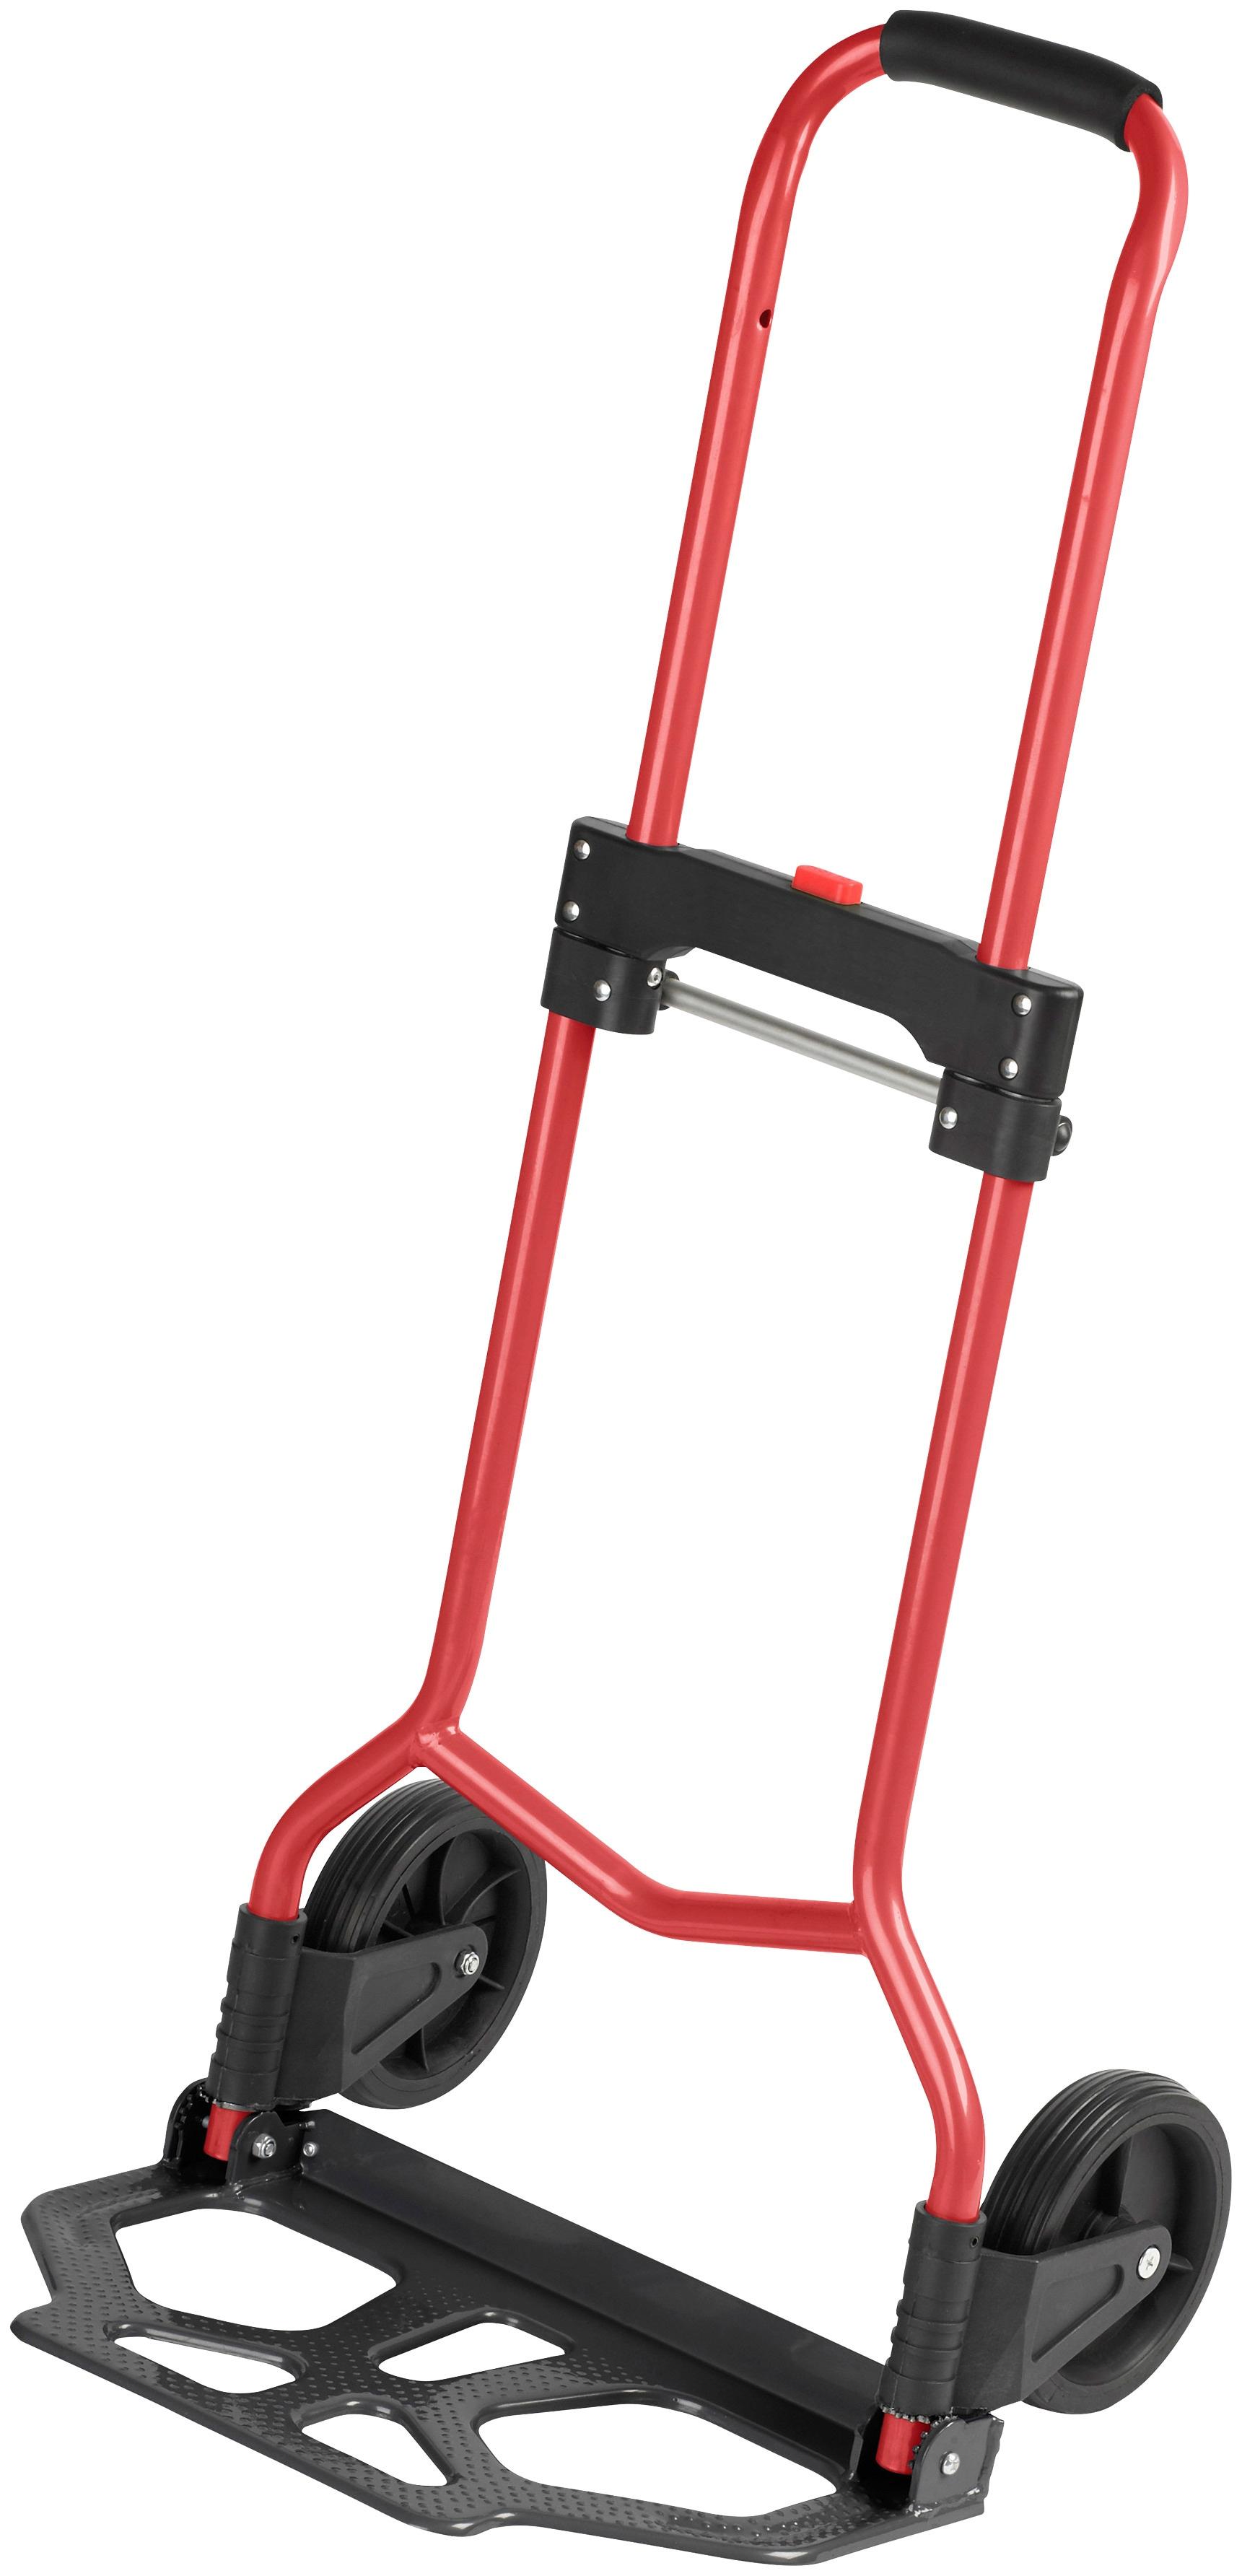 meister Sackkarre rot Sackkarren Transport Werkzeug Maschinen